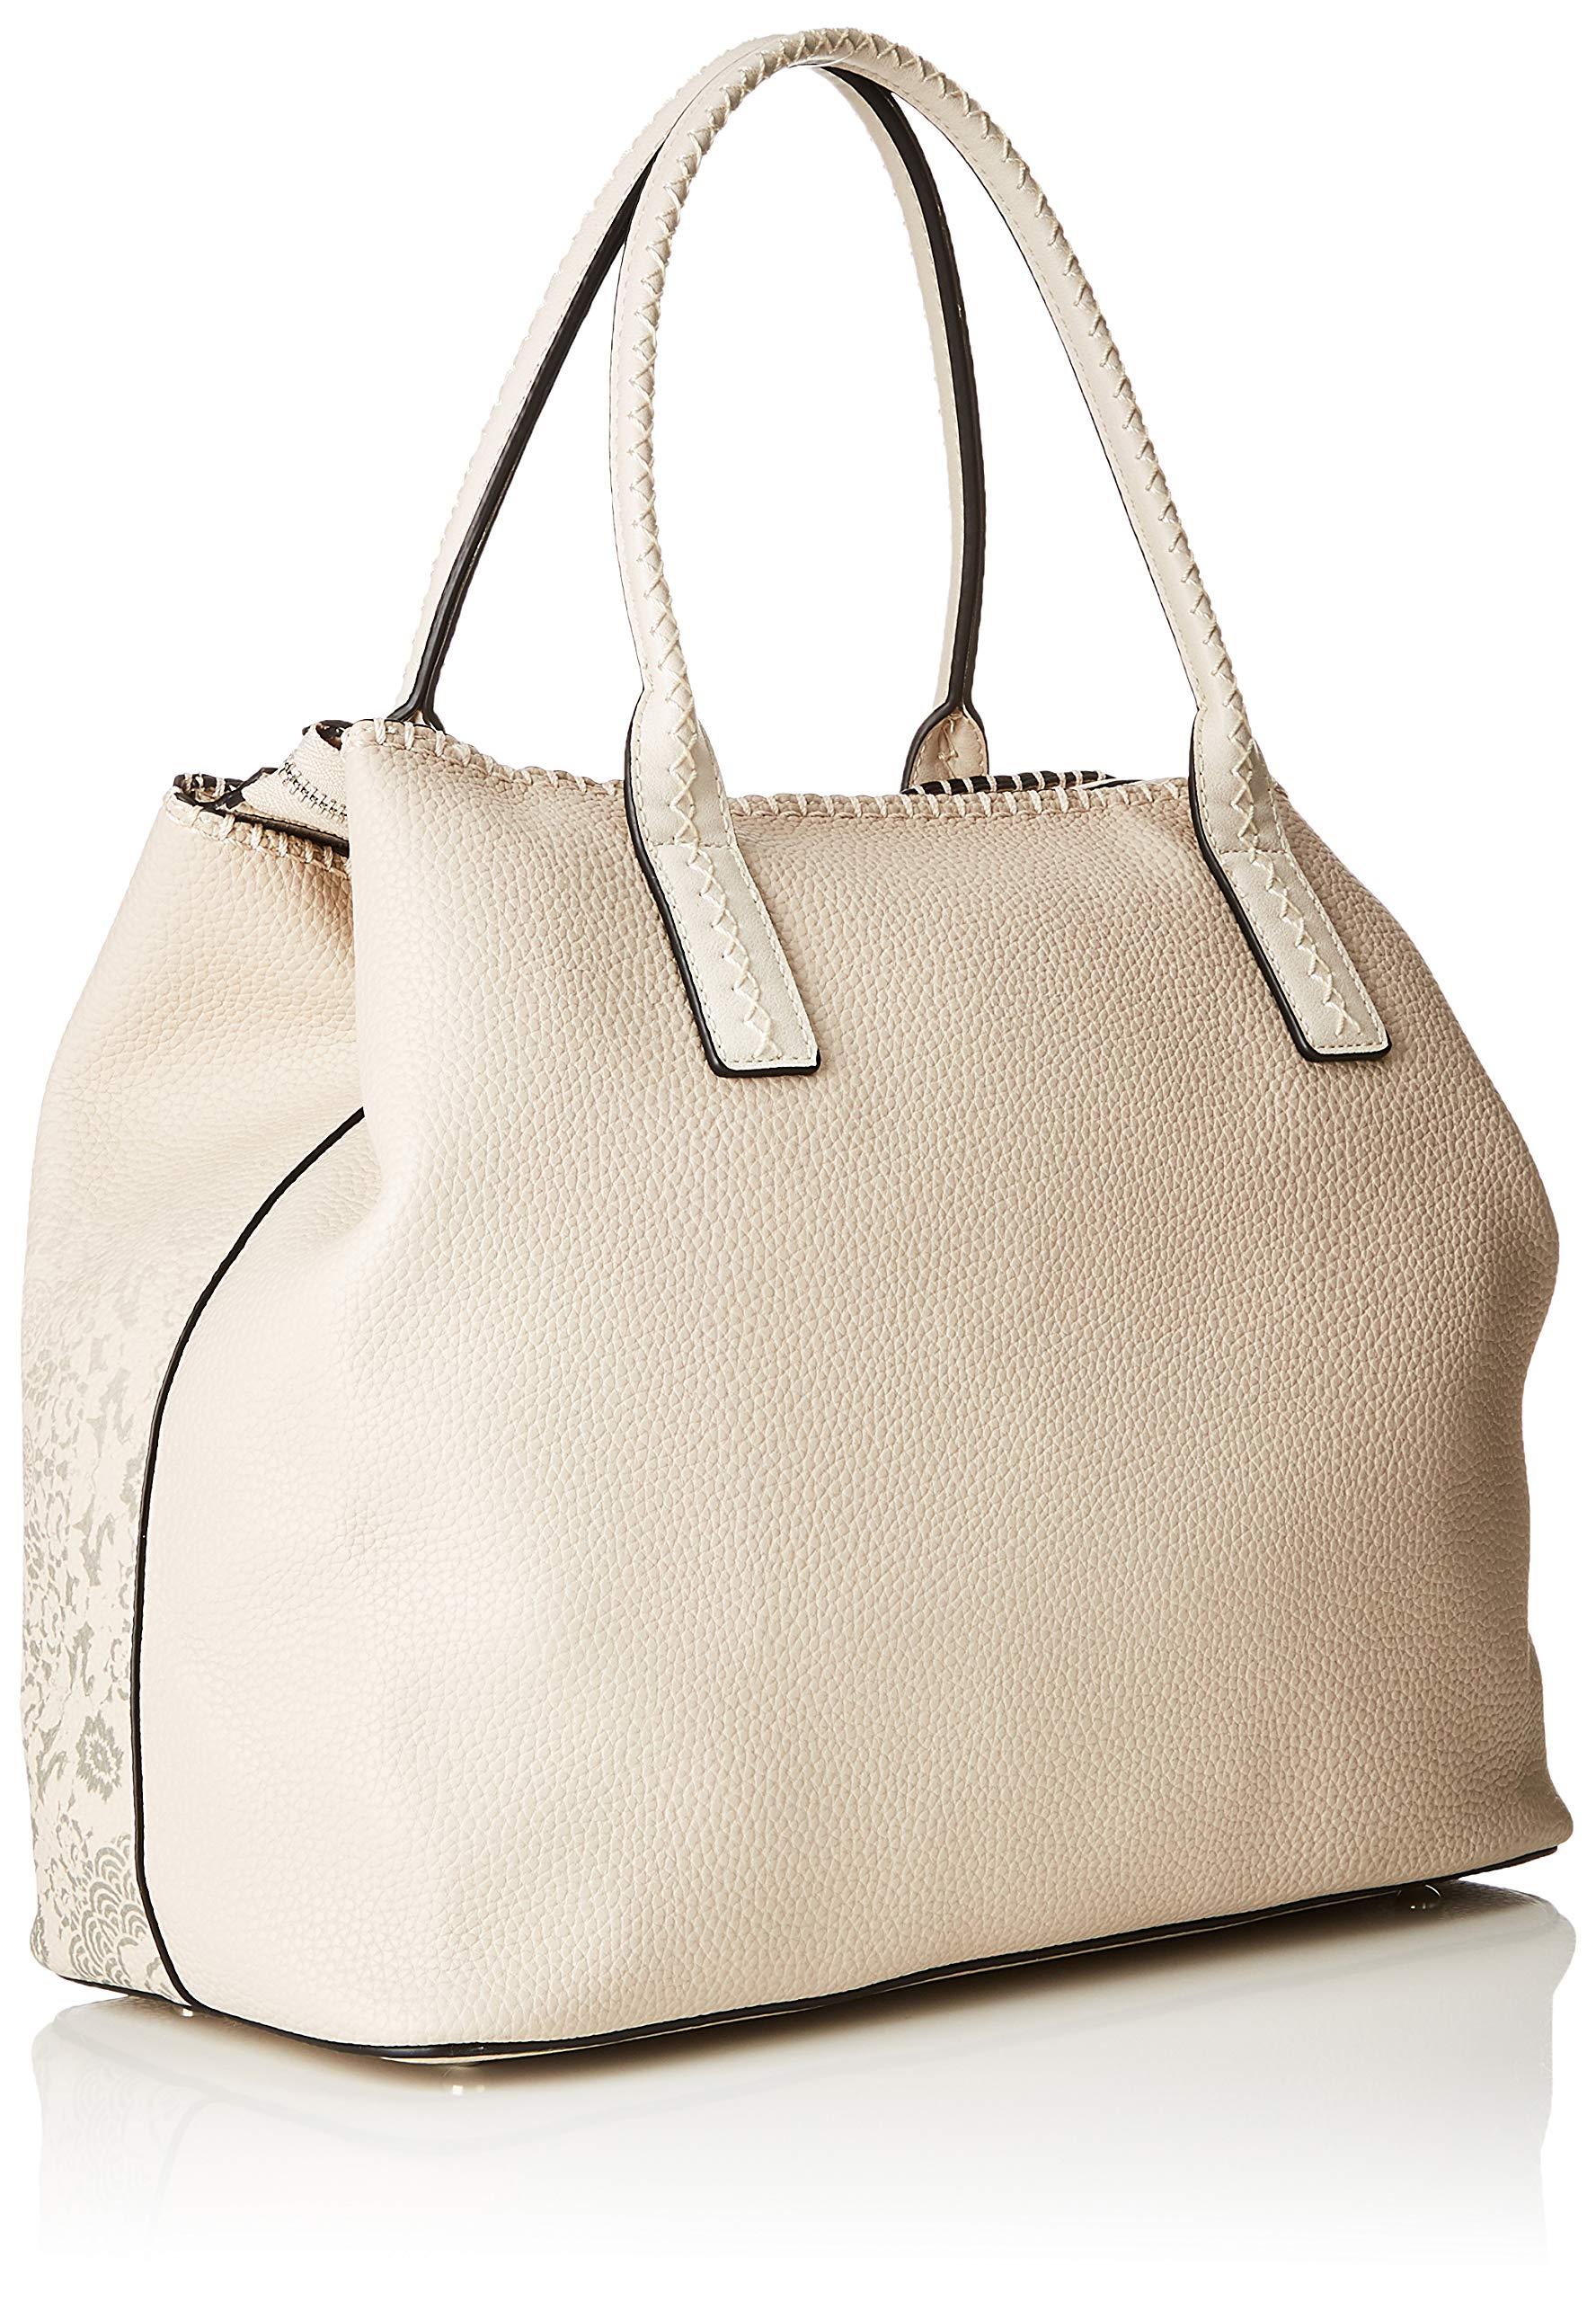 Desigual - Bag Double Gin_holbox Women, Borse a spalla Donna 3 spesavip